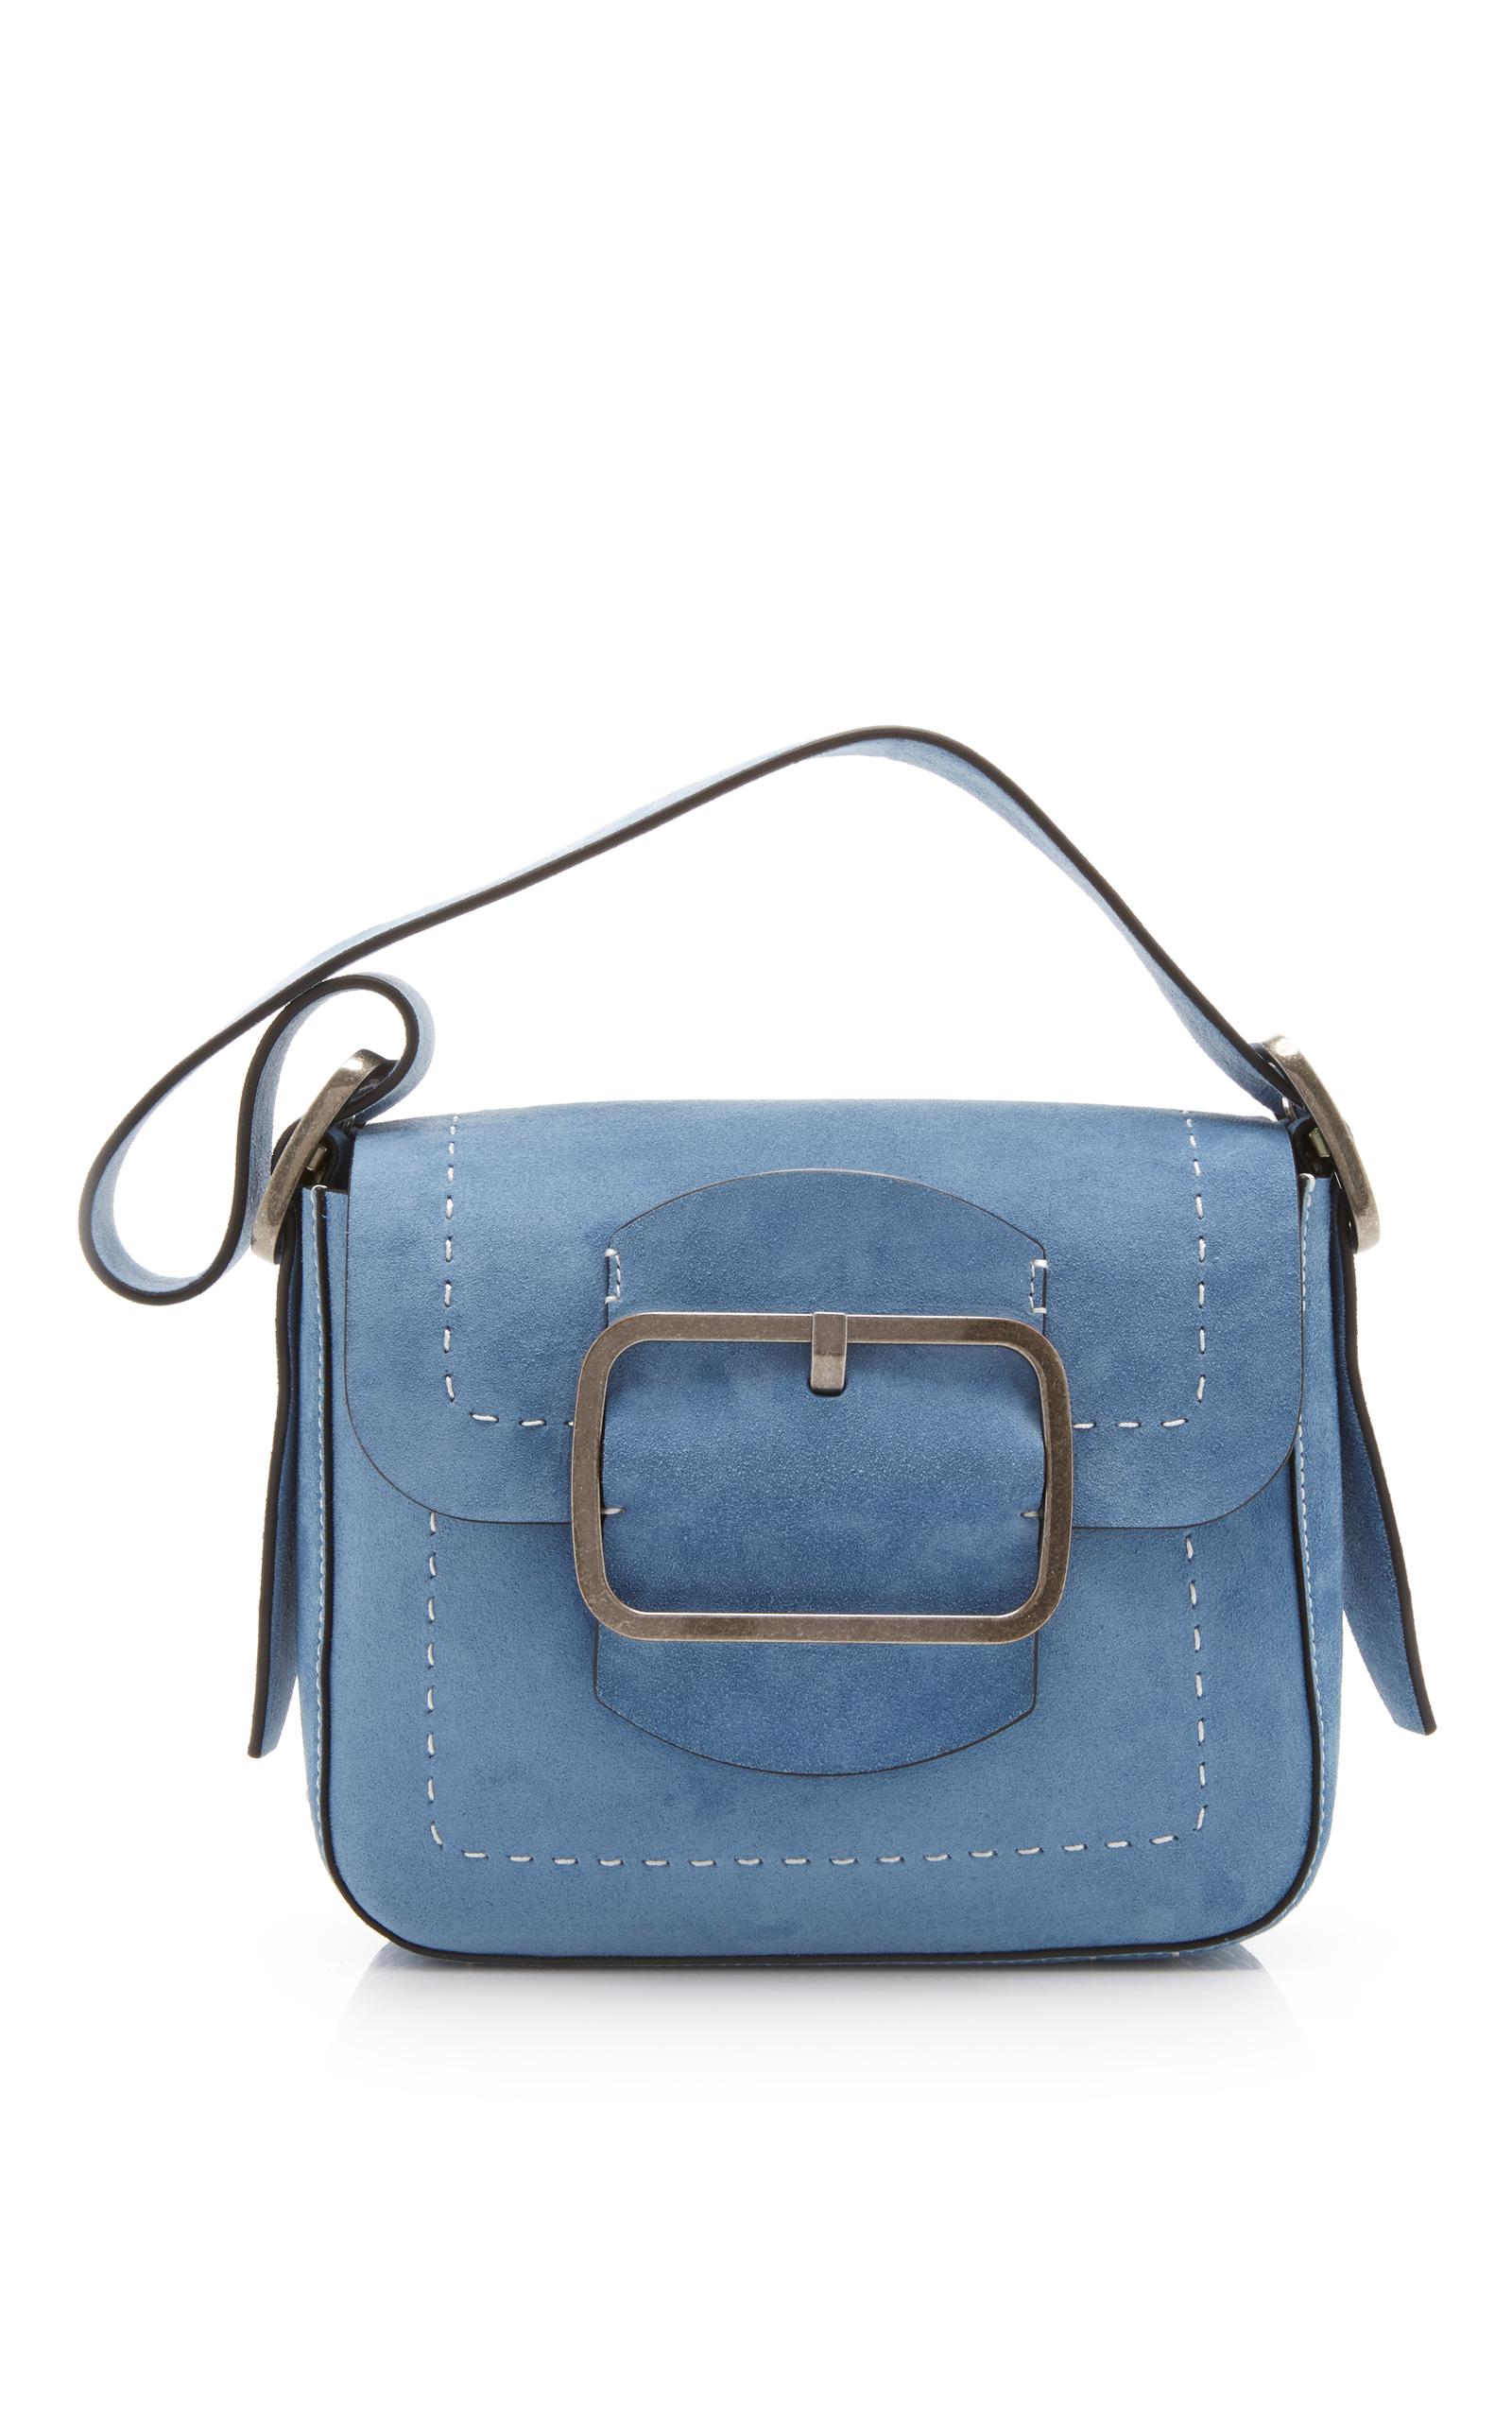 f0cad28ca96 Tory BurchSawyer Suede Small Shoulder Bag. CLOSE. Loading